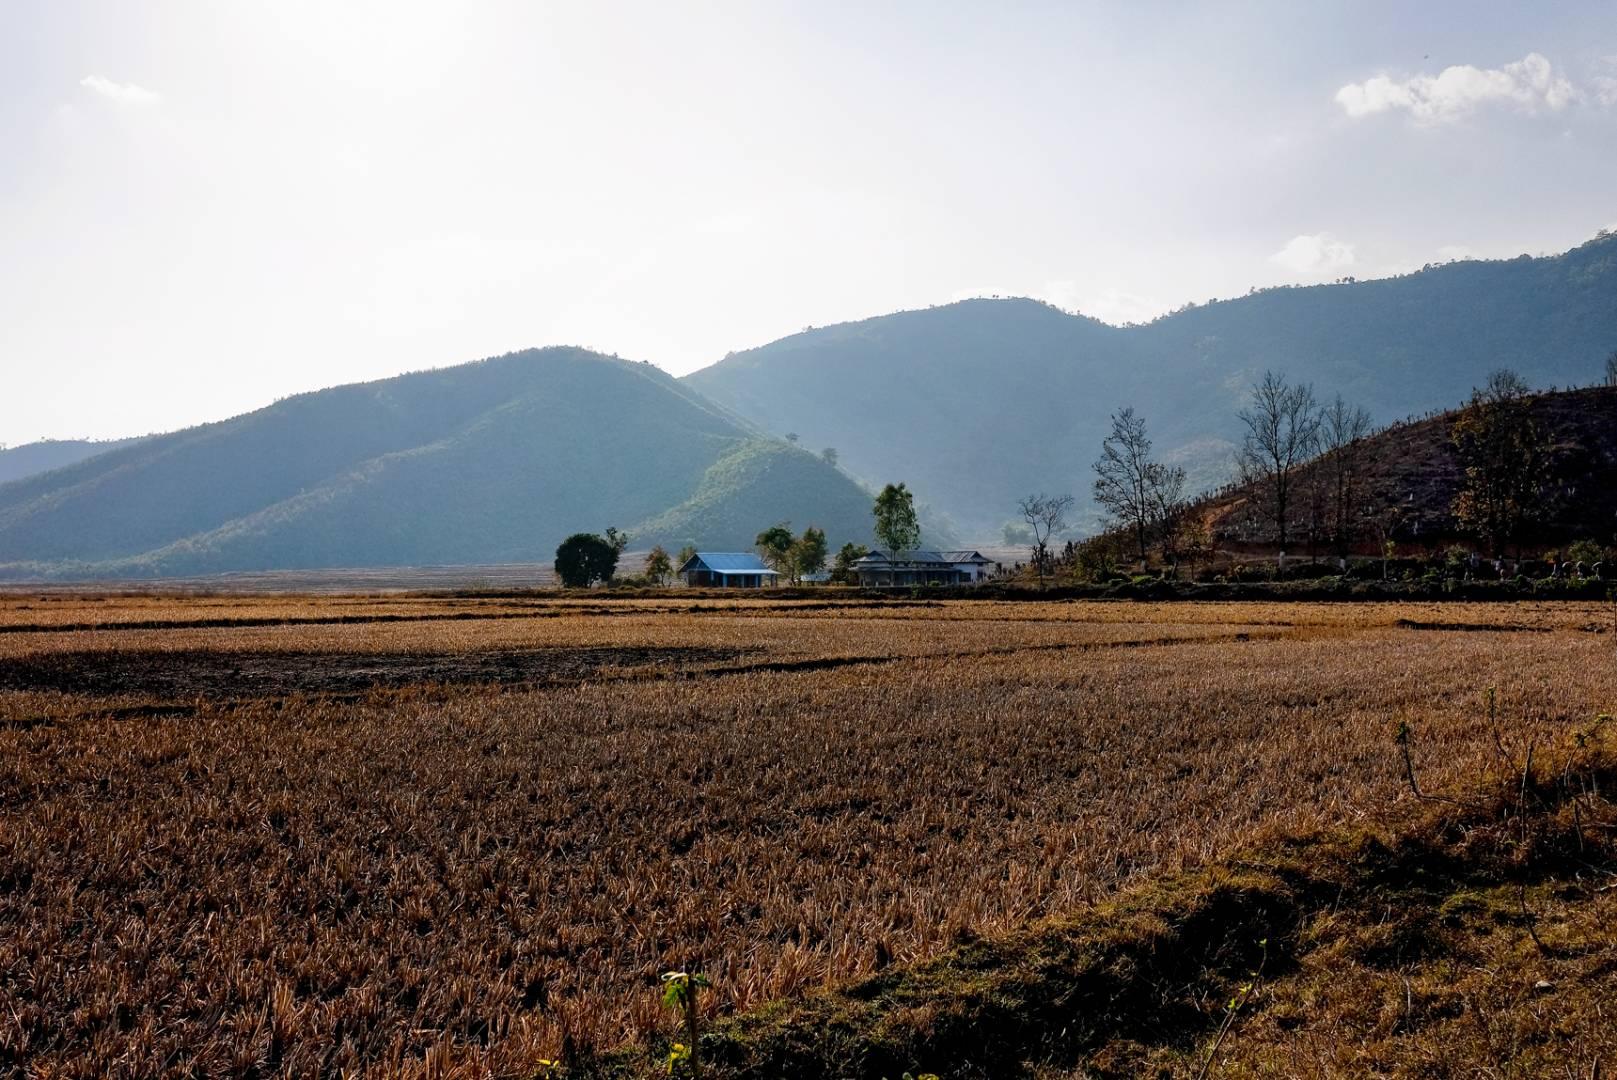 The Battlefield of Nungshigum